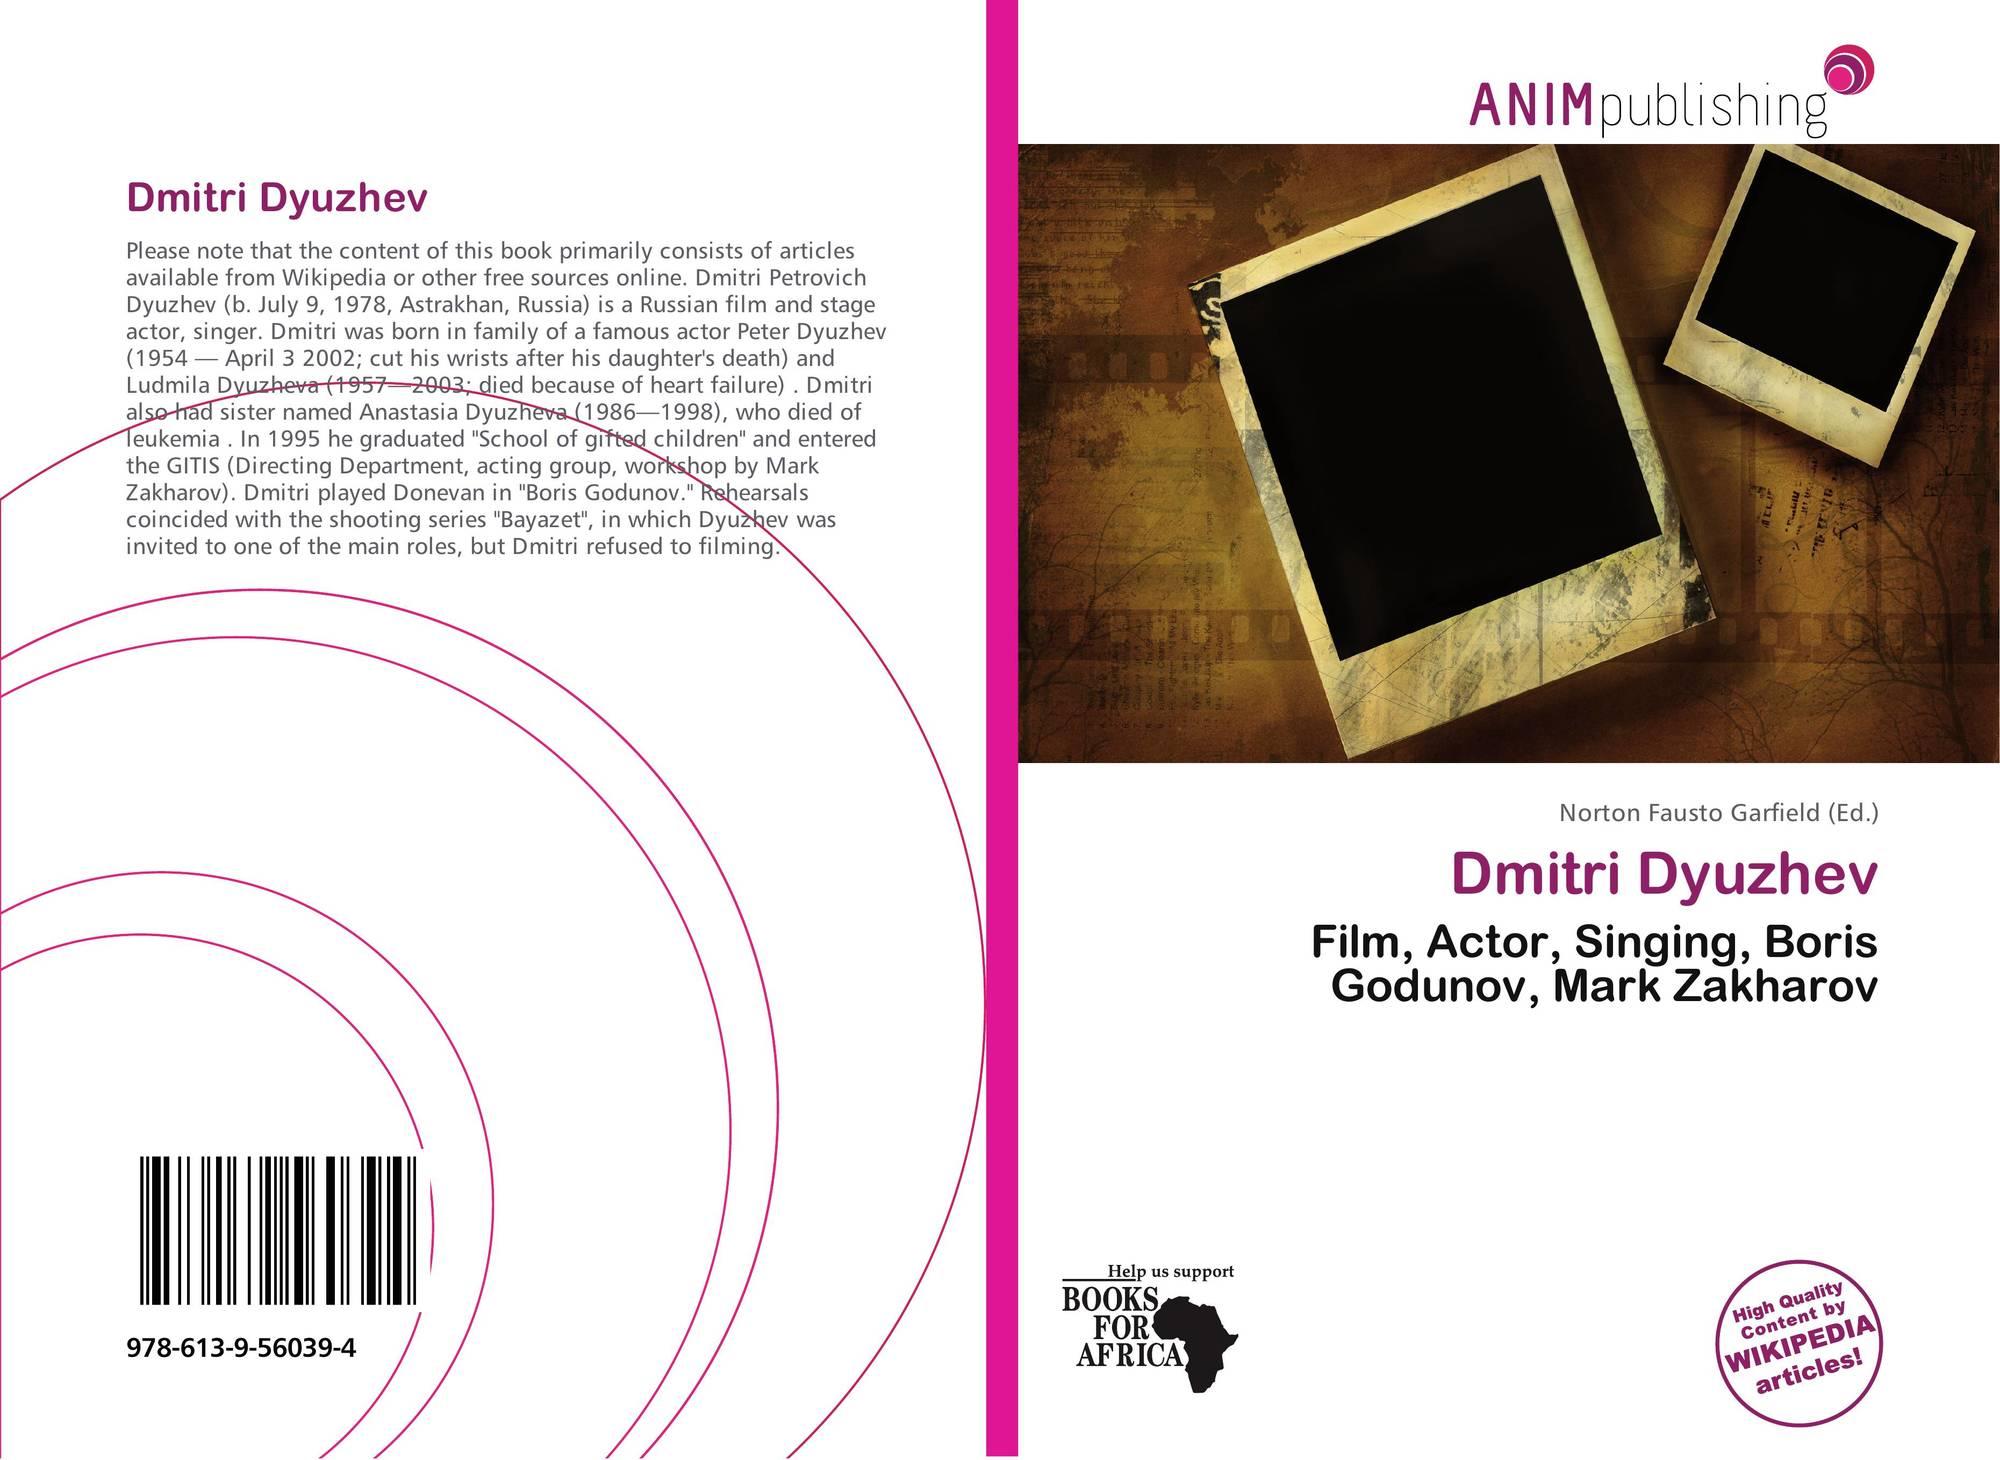 Dmitri Dyuzhev, 978-613-9-56039-4, 613956039X ,9786139560394